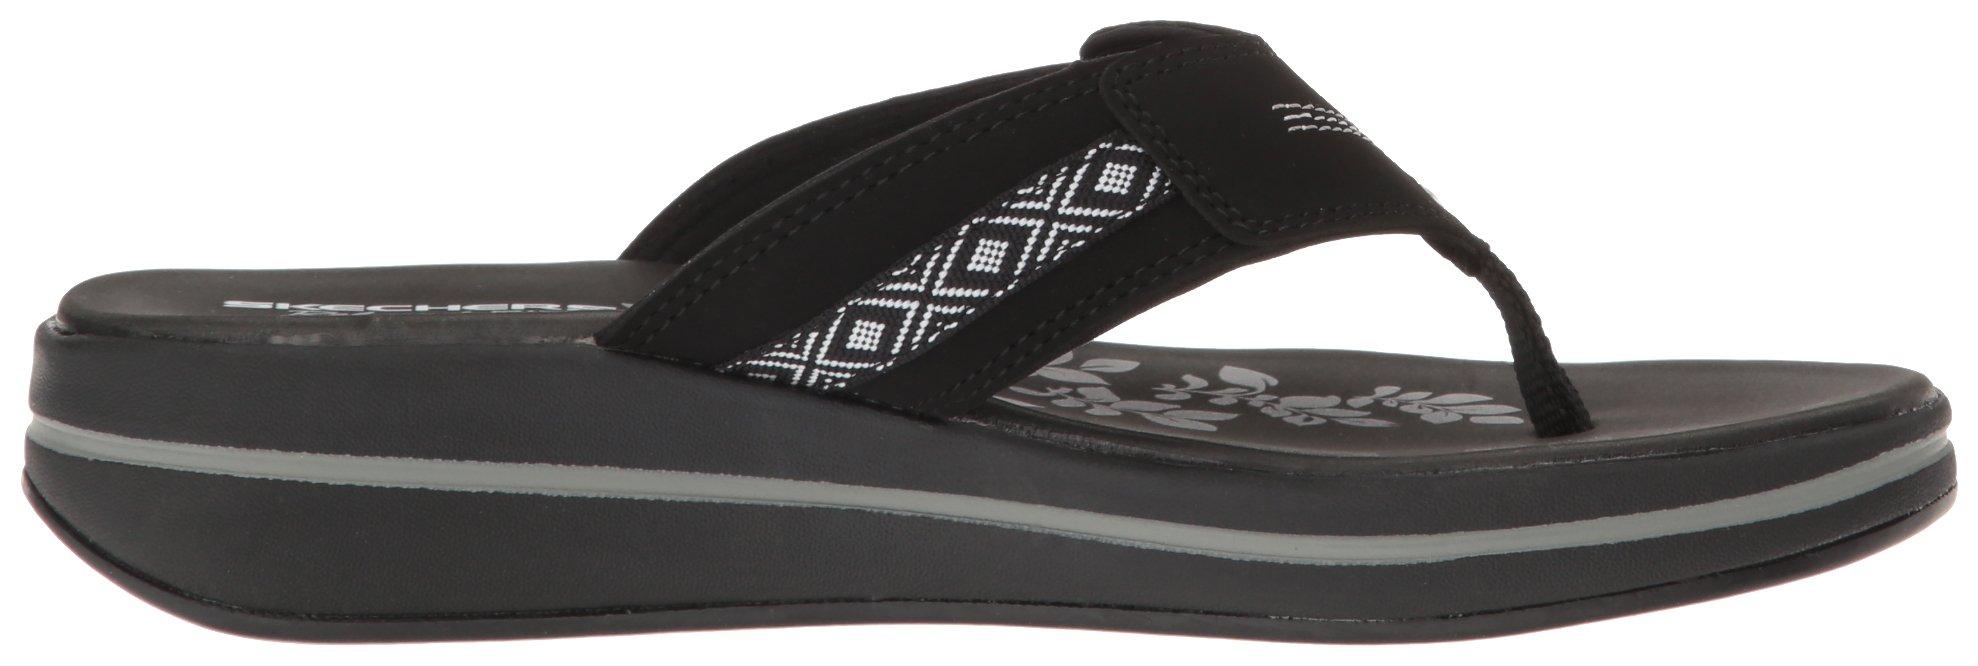 Skechers Modern Comfort Sandals Women's Upgrades Marina Bay Flip Flop Black/White, 8 M US by Skechers (Image #7)